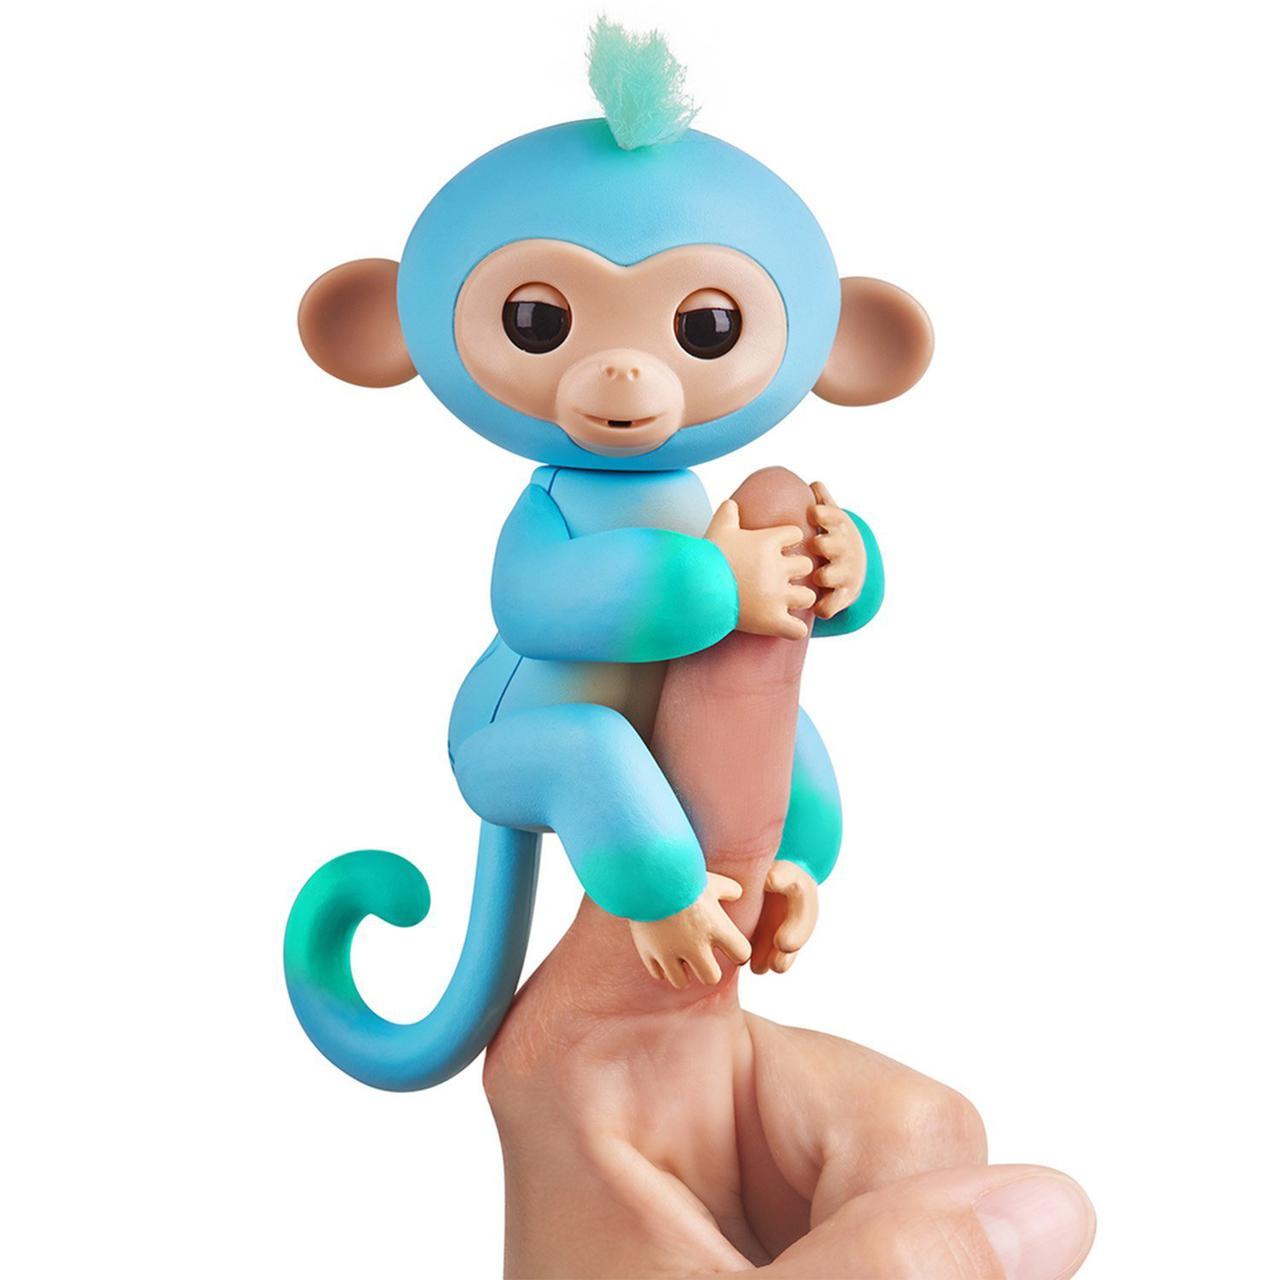 Оригинал обезьянка серия 2 - Чарли фингерлинг  WowWee Fingerlings Monkey - Charlie